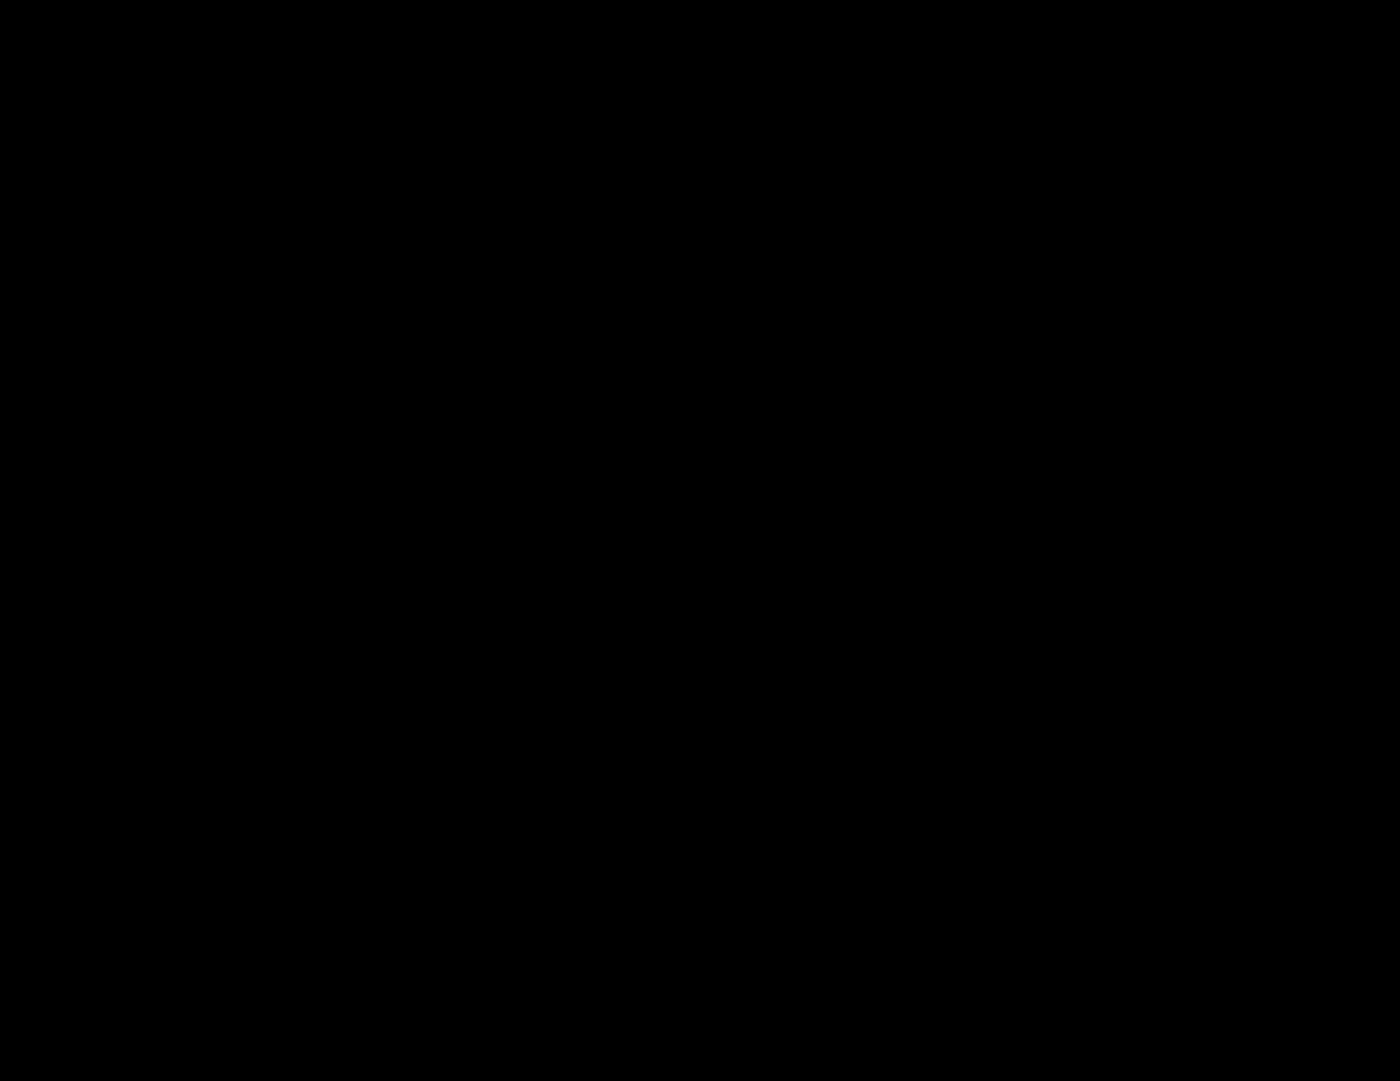 doppelhaus-bauhaus-dachterrasse-grundriss-dg-1